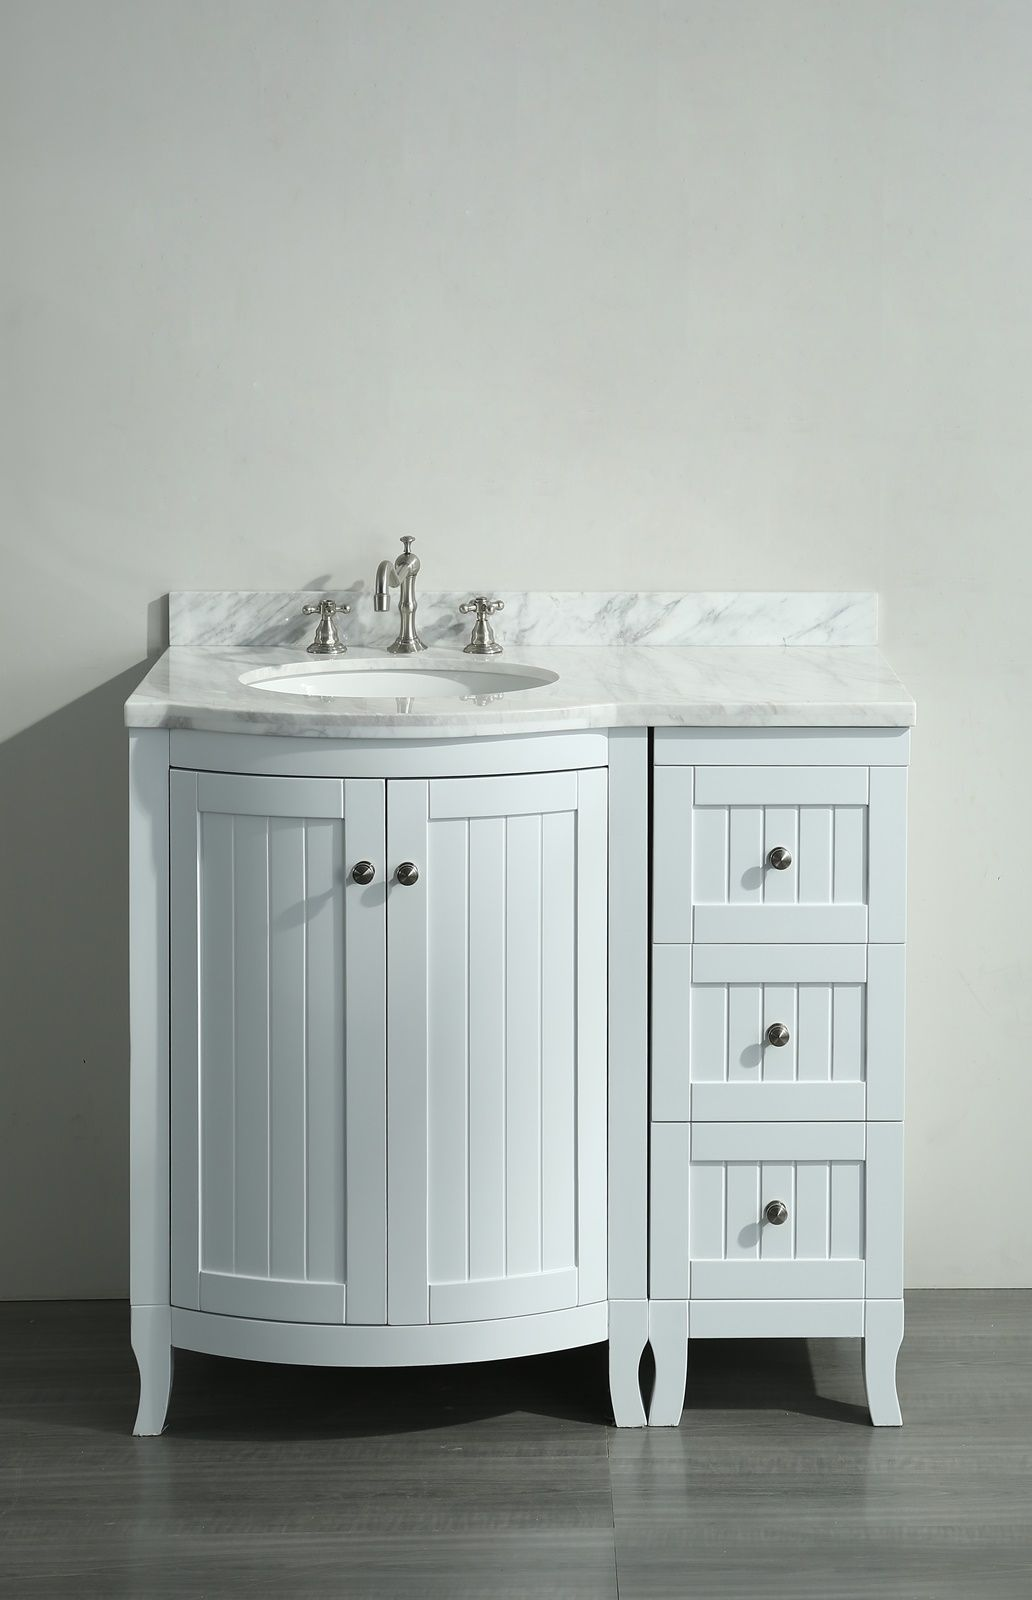 White 36 Inch Bathroom Vanity White Carrera Marble Top | Bathroom